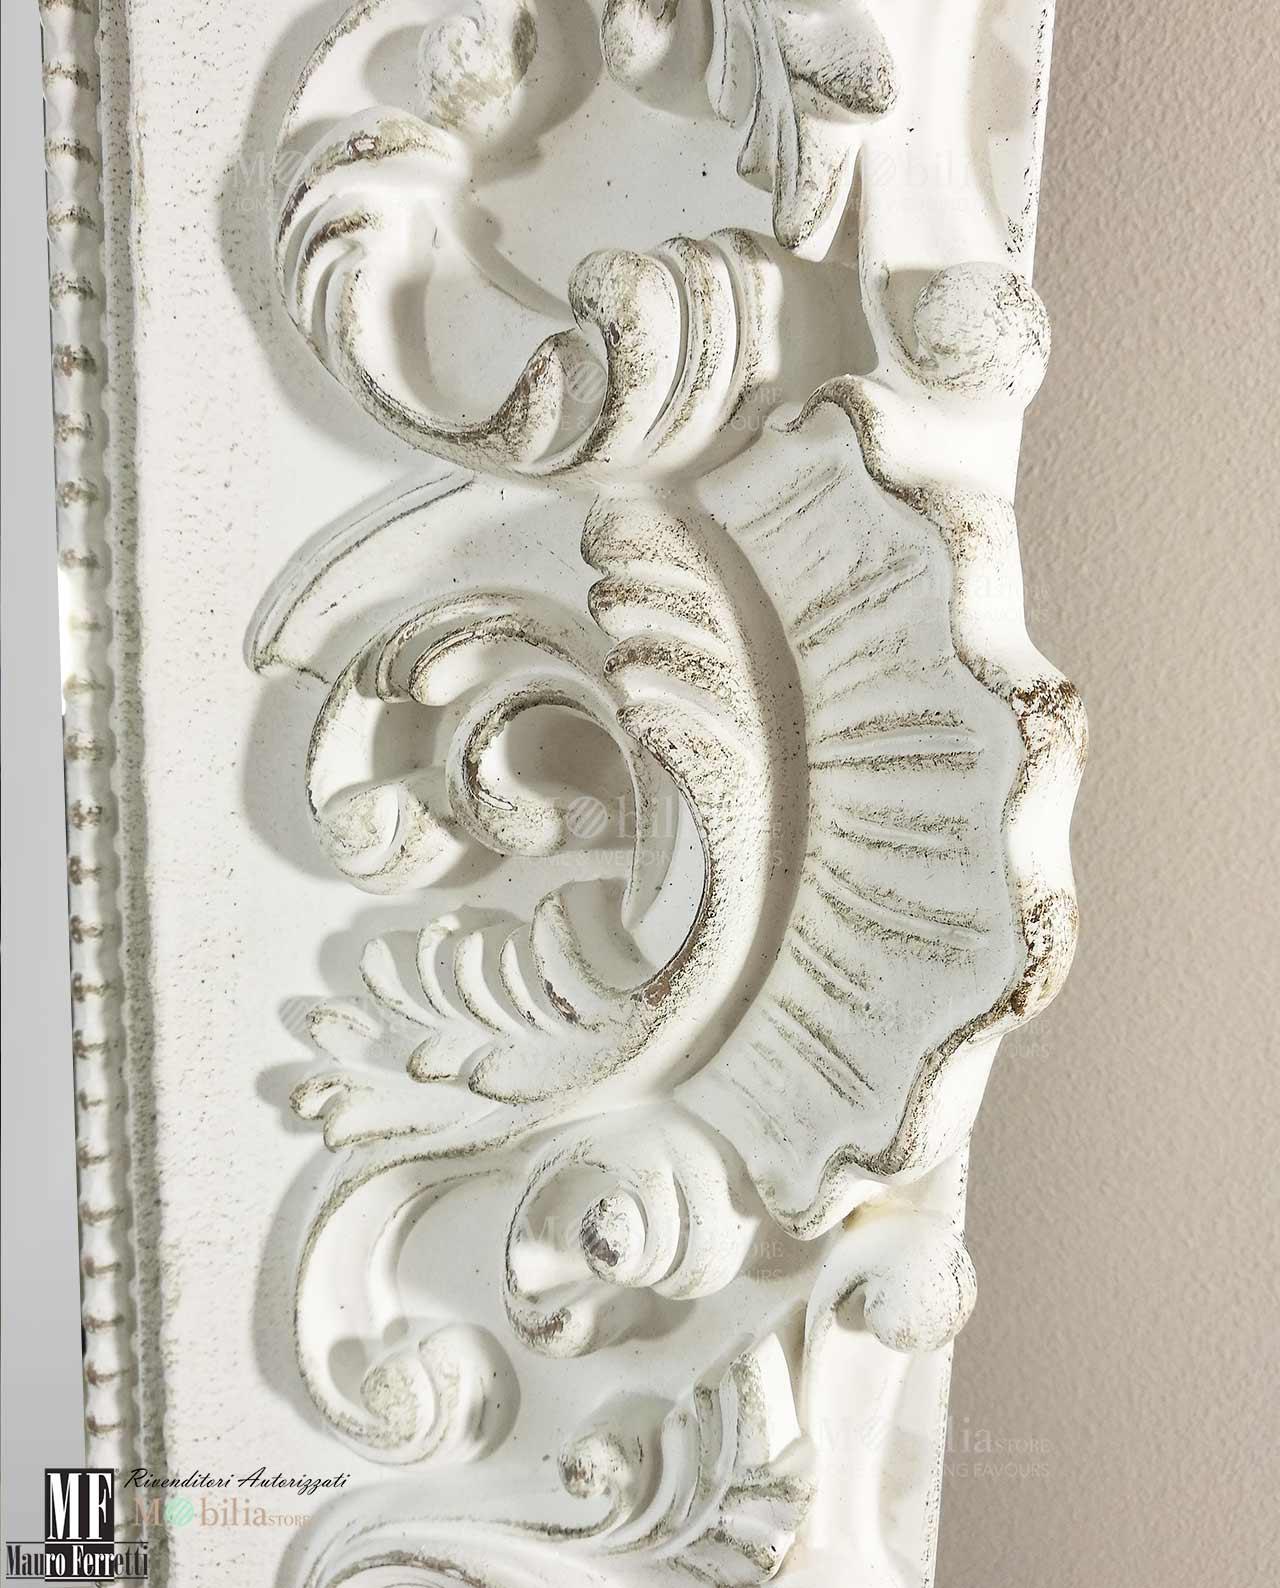 Specchio da parete shabby chic mobilia store home favours - Parete shabby chic ...